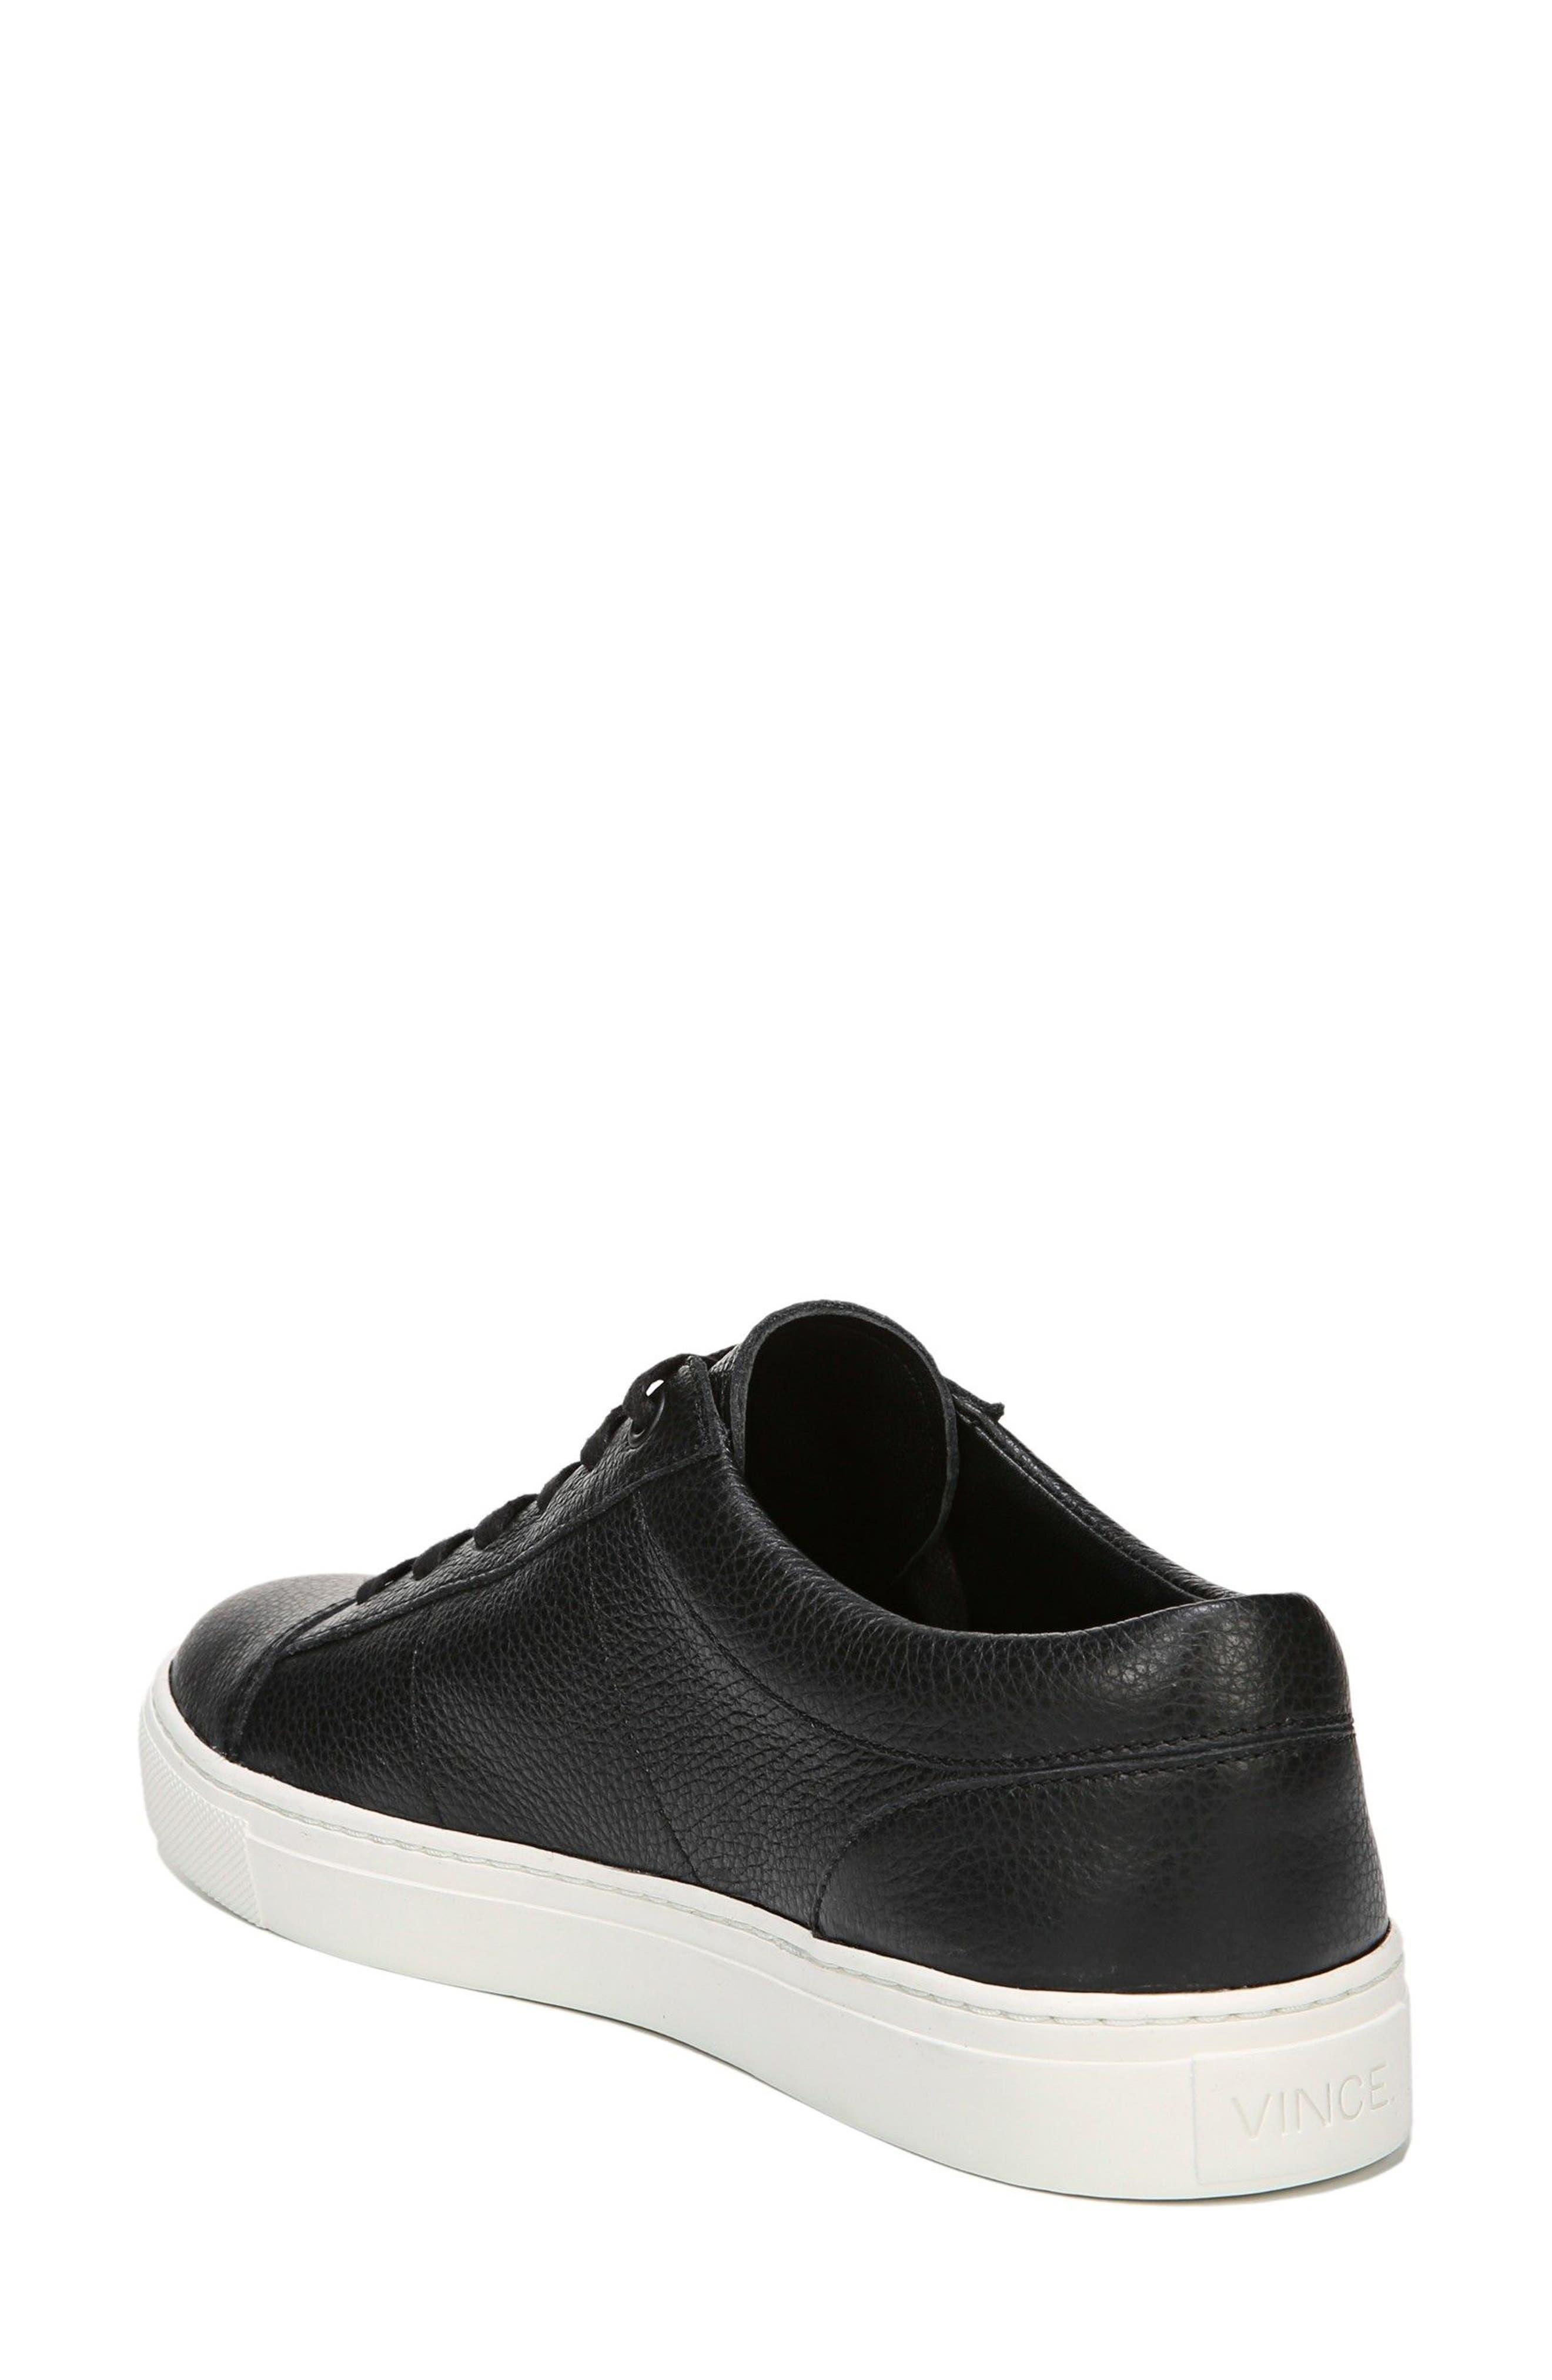 Afton Sneaker,                             Alternate thumbnail 2, color,                             001